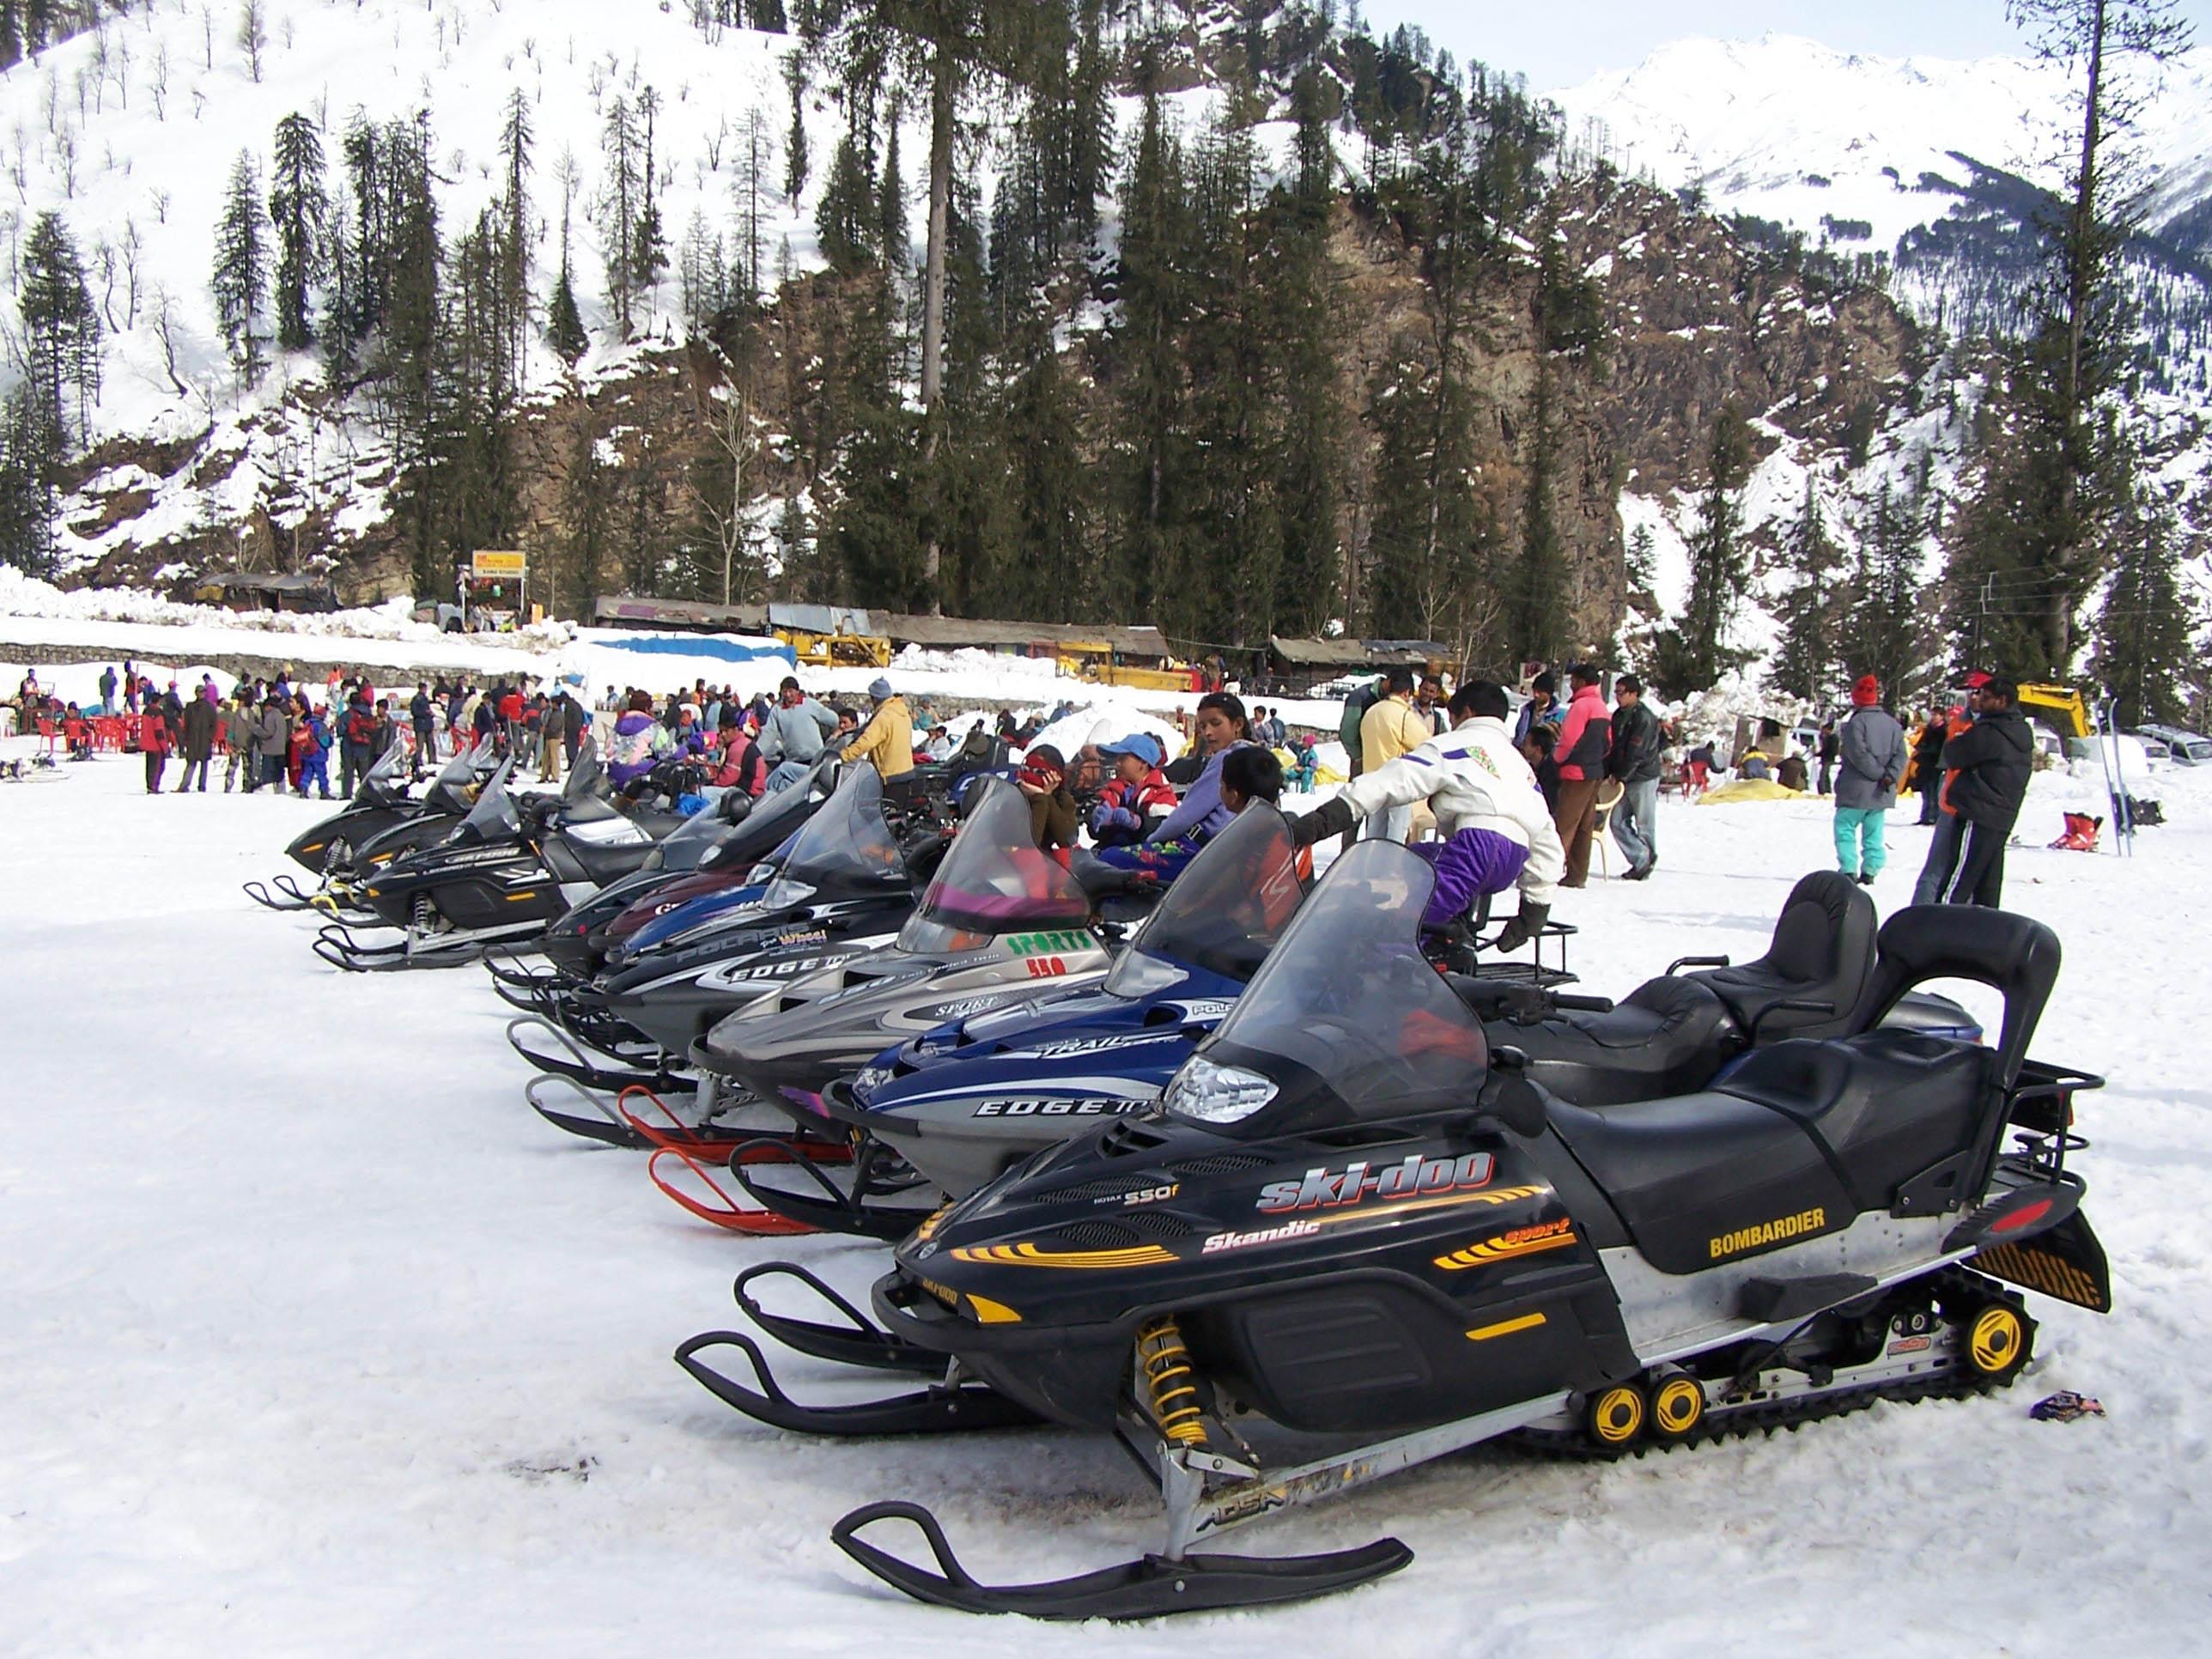 snow-scooter-solang-nala-manali.jpg